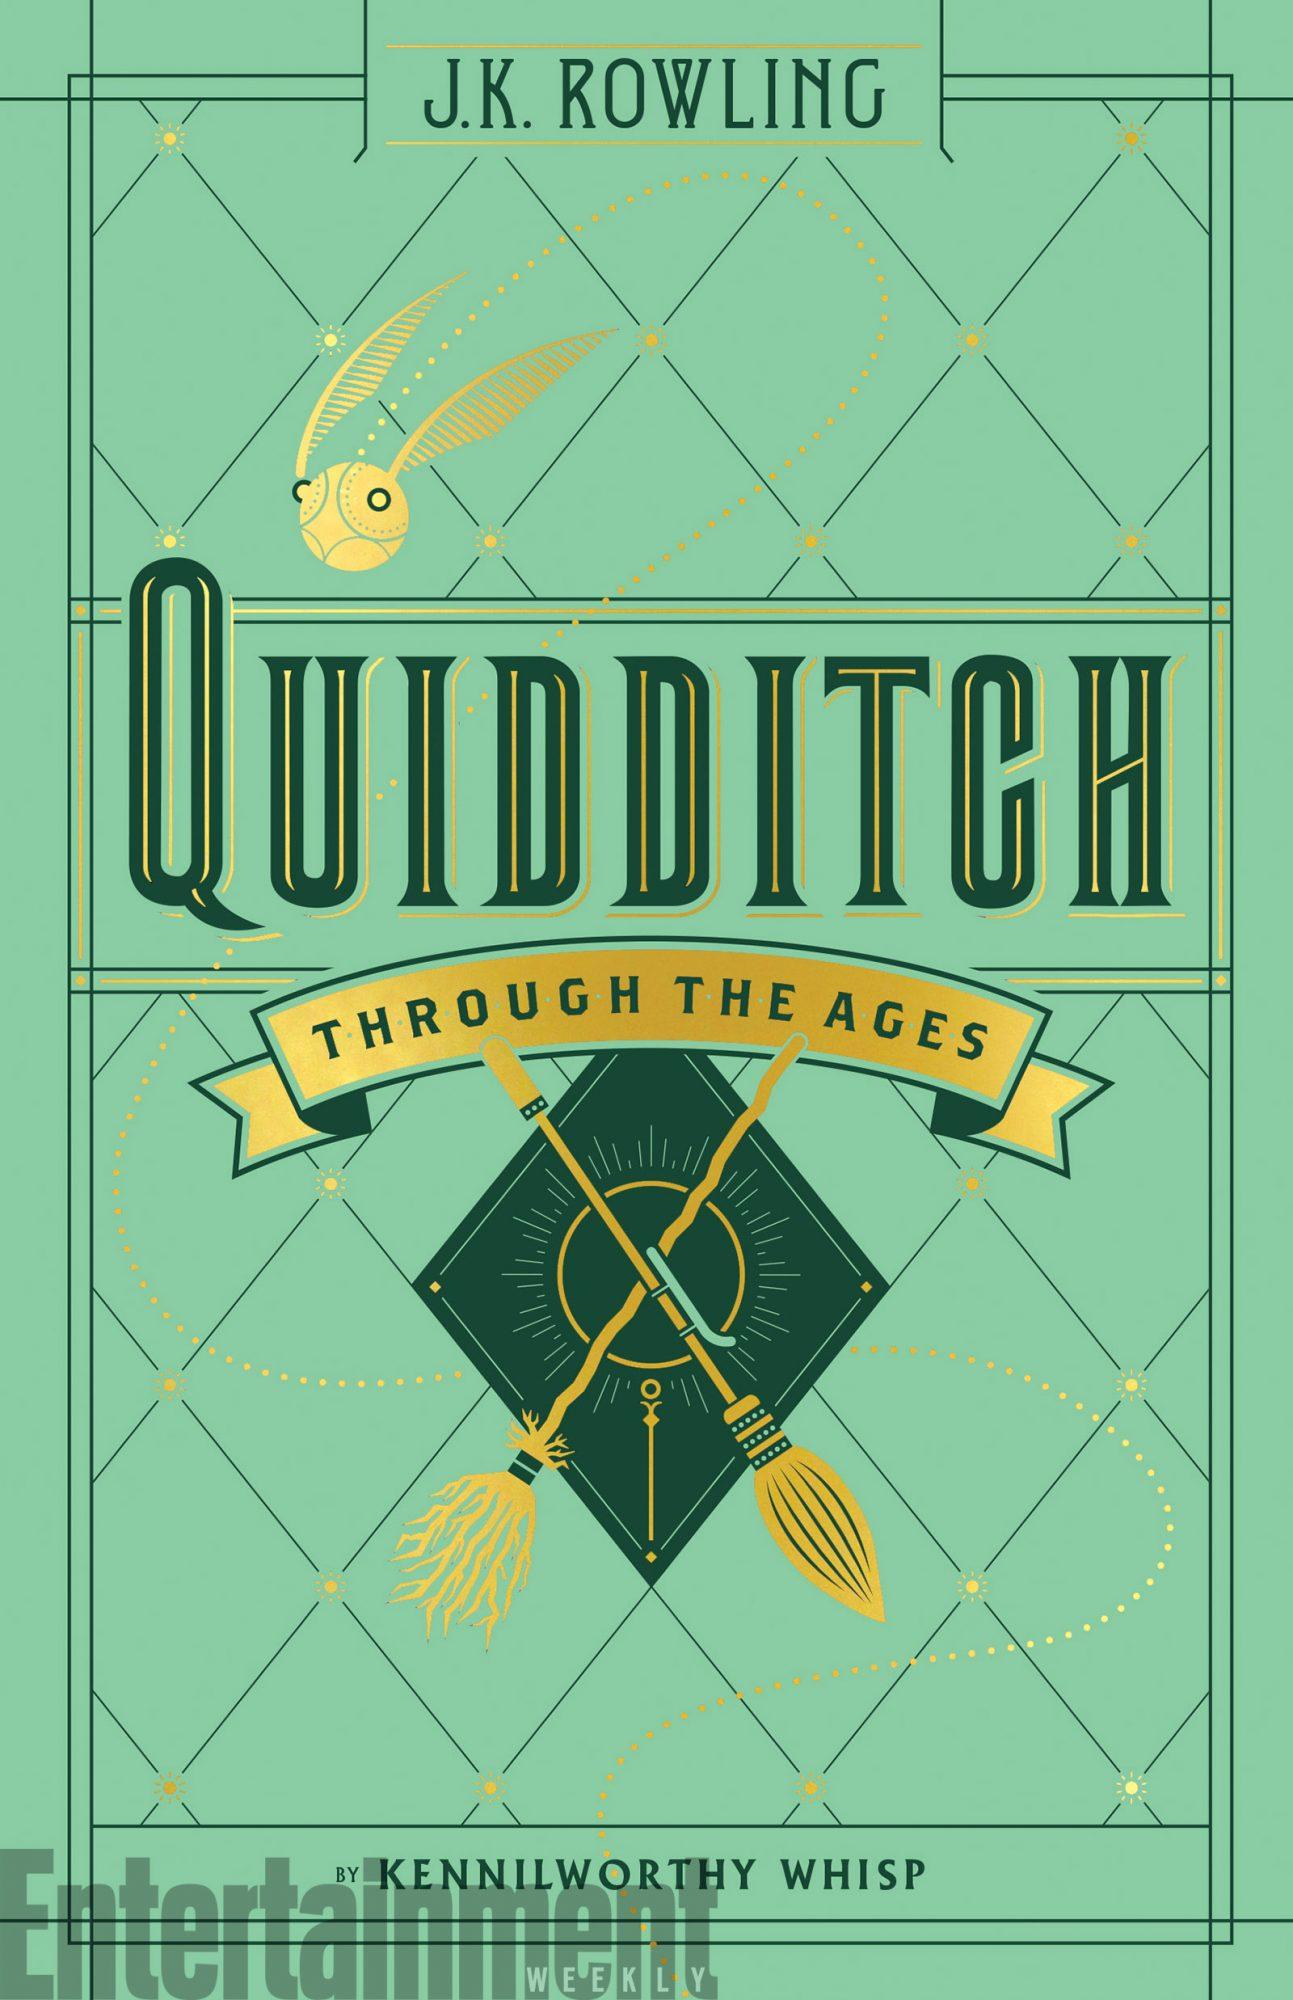 ew-potter-qudditch-new-u-s-edition-final